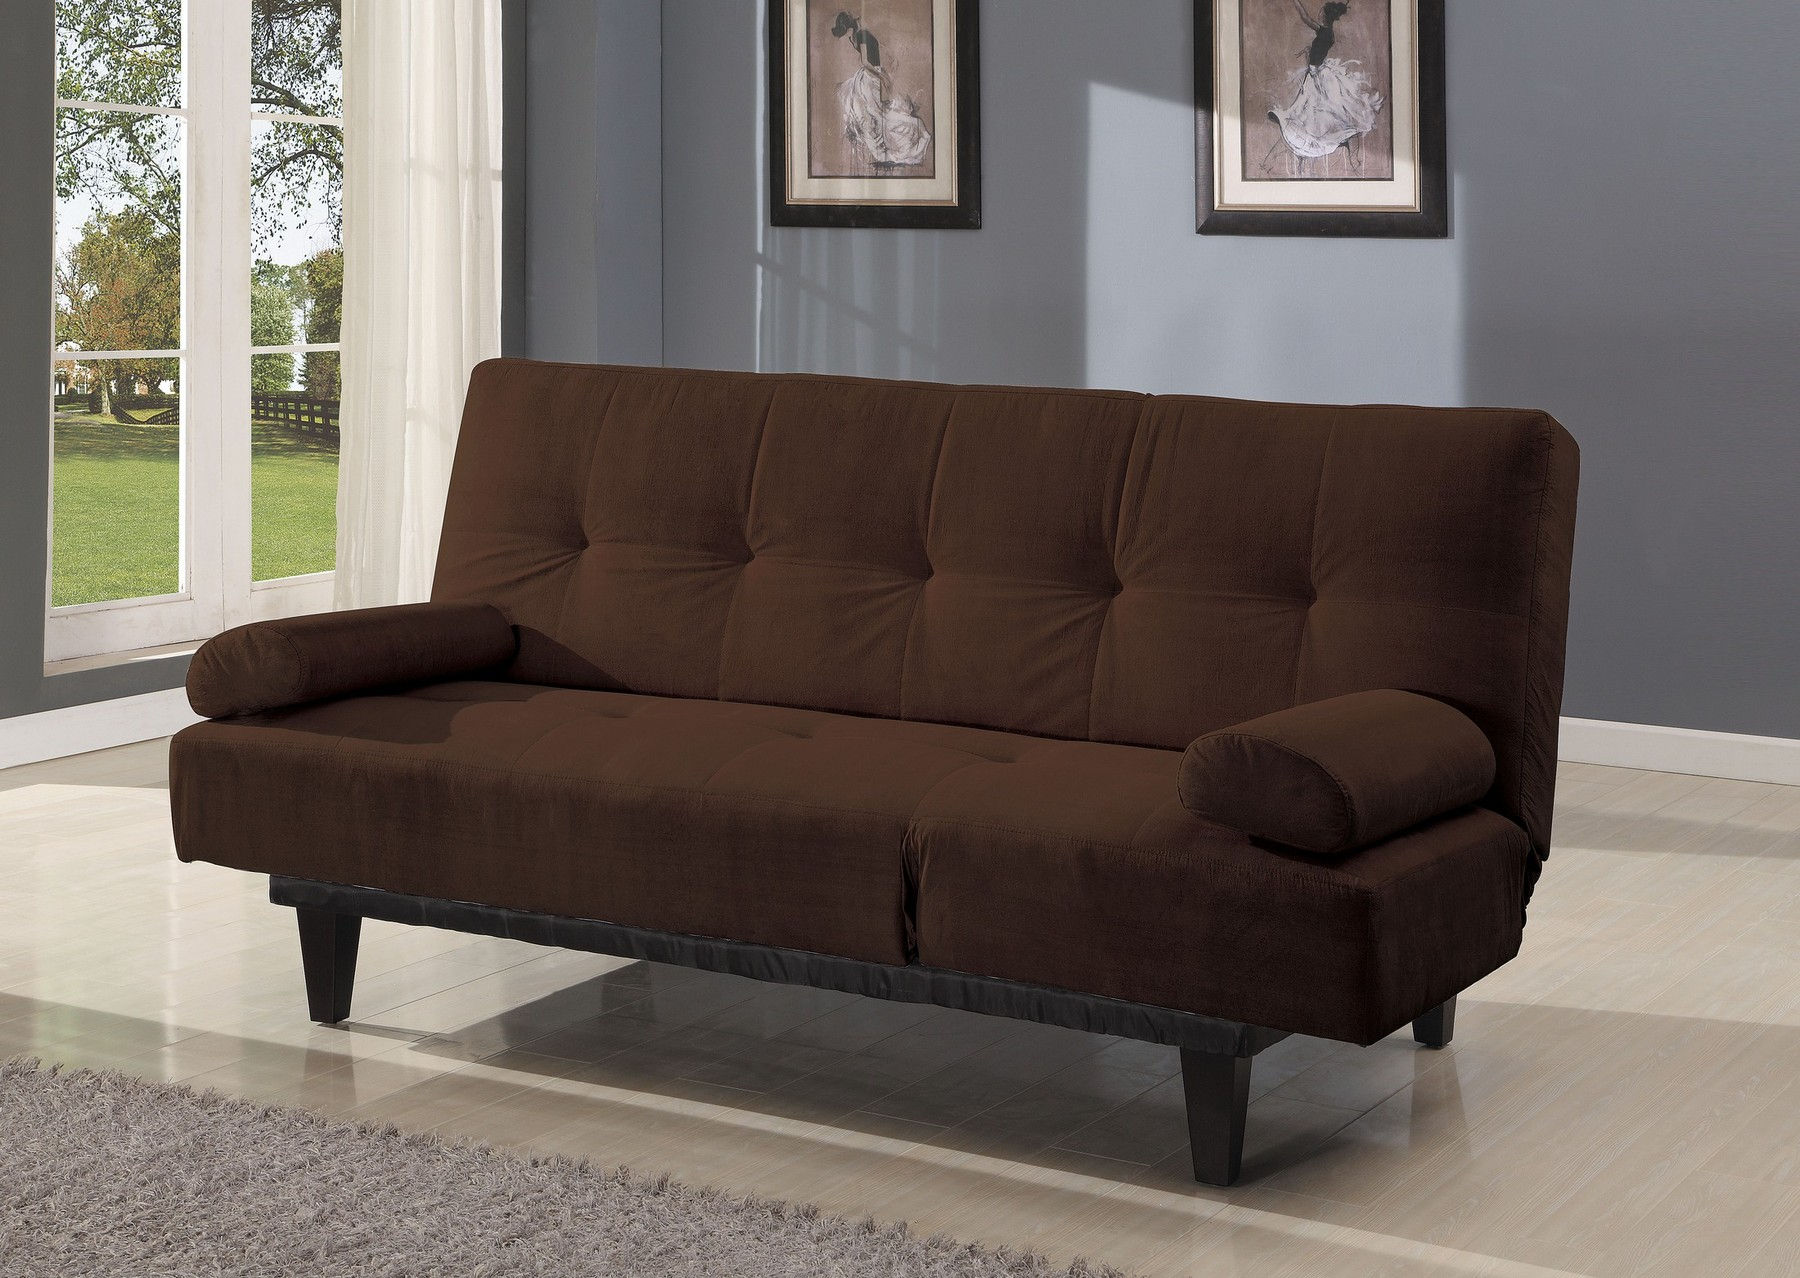 - Cybil Brown Sofa Bed 05855W-BR Acme Corporation Sleeper Sofas